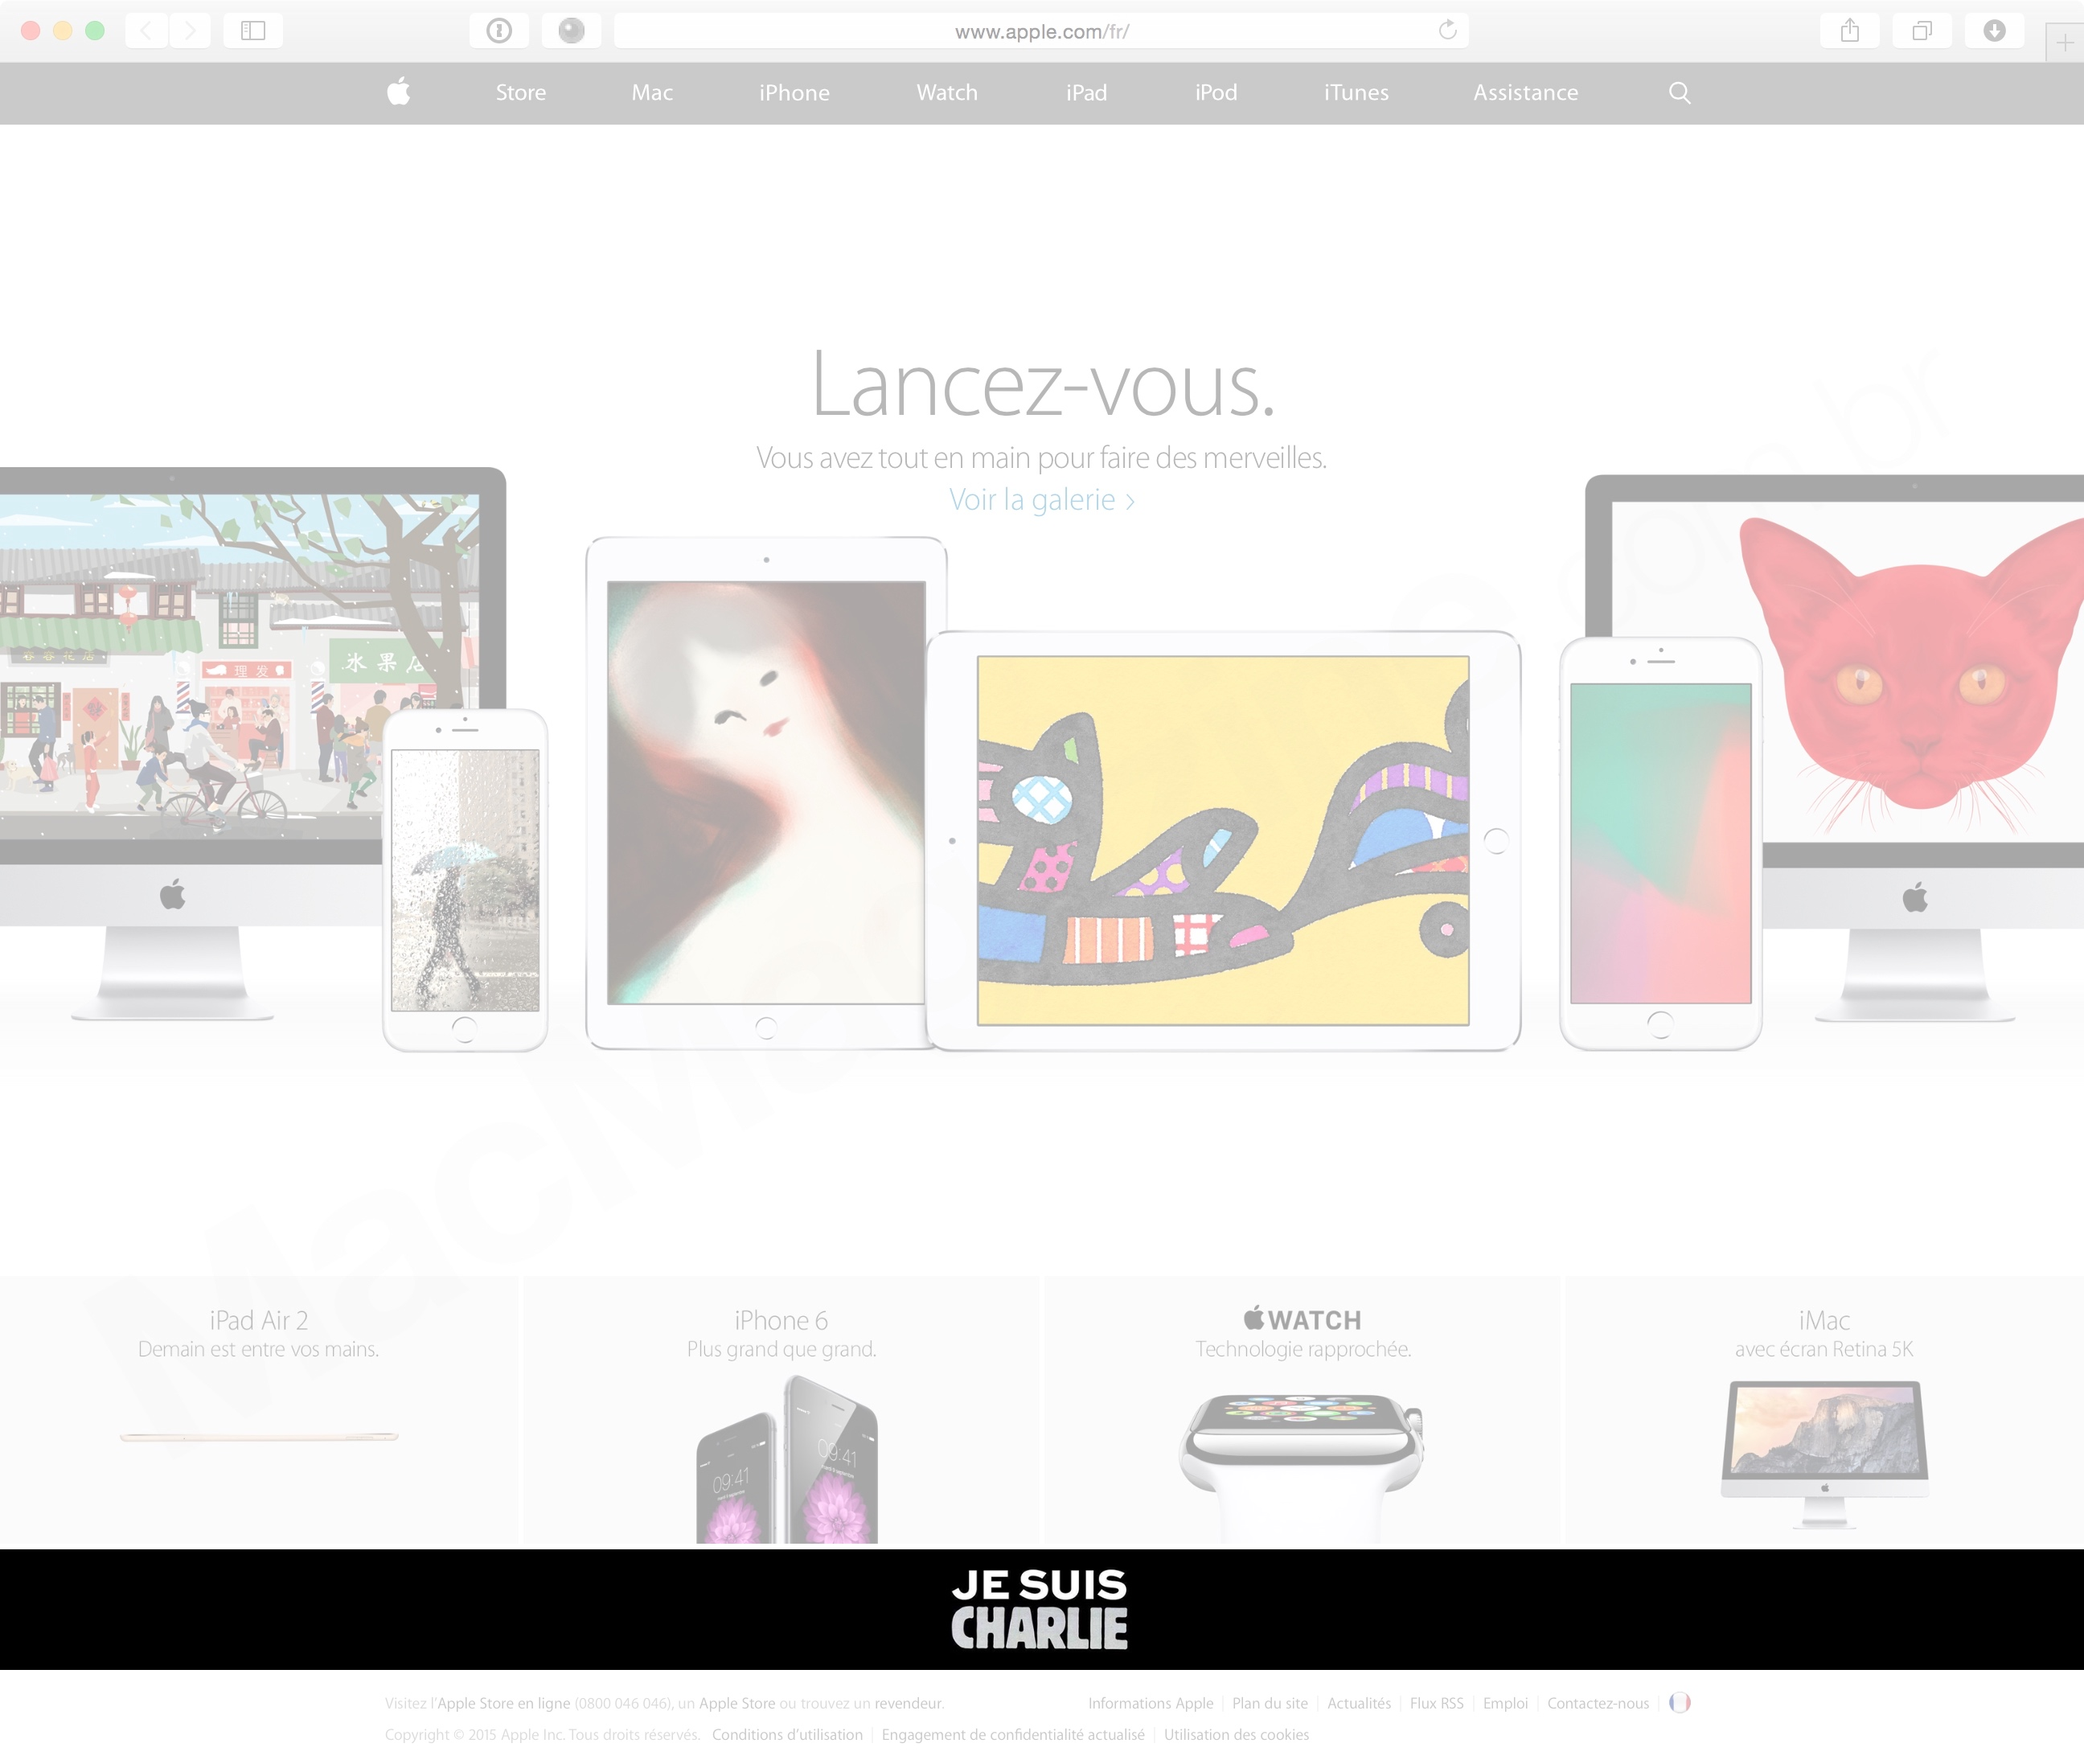 """Je suis Charlie"" no Apple.com/fr"